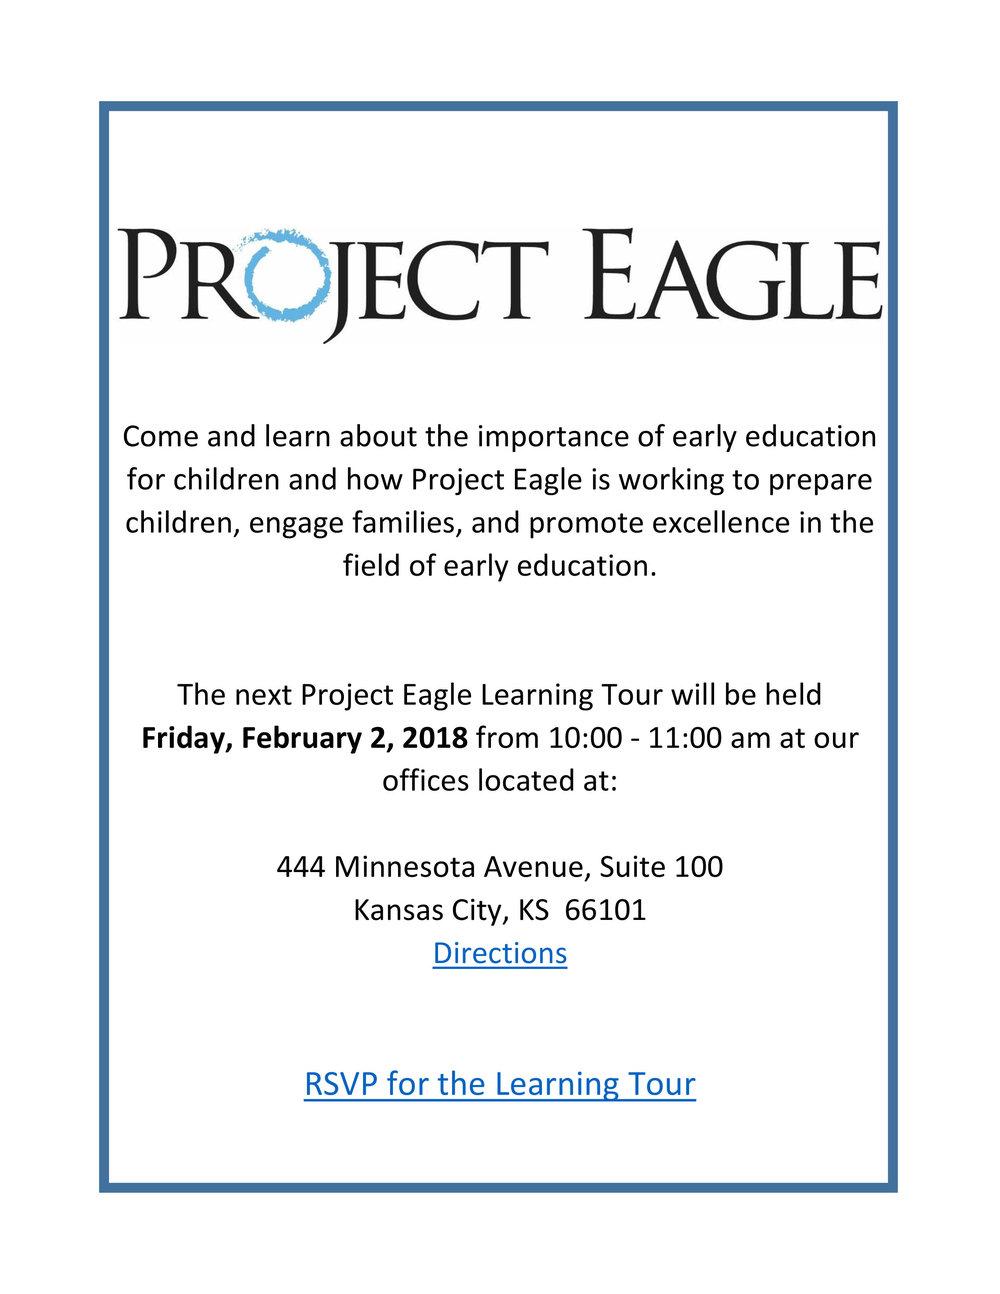 Project Eagle Learning Tour_Kansas City, Kansas_02.02.18.jpg